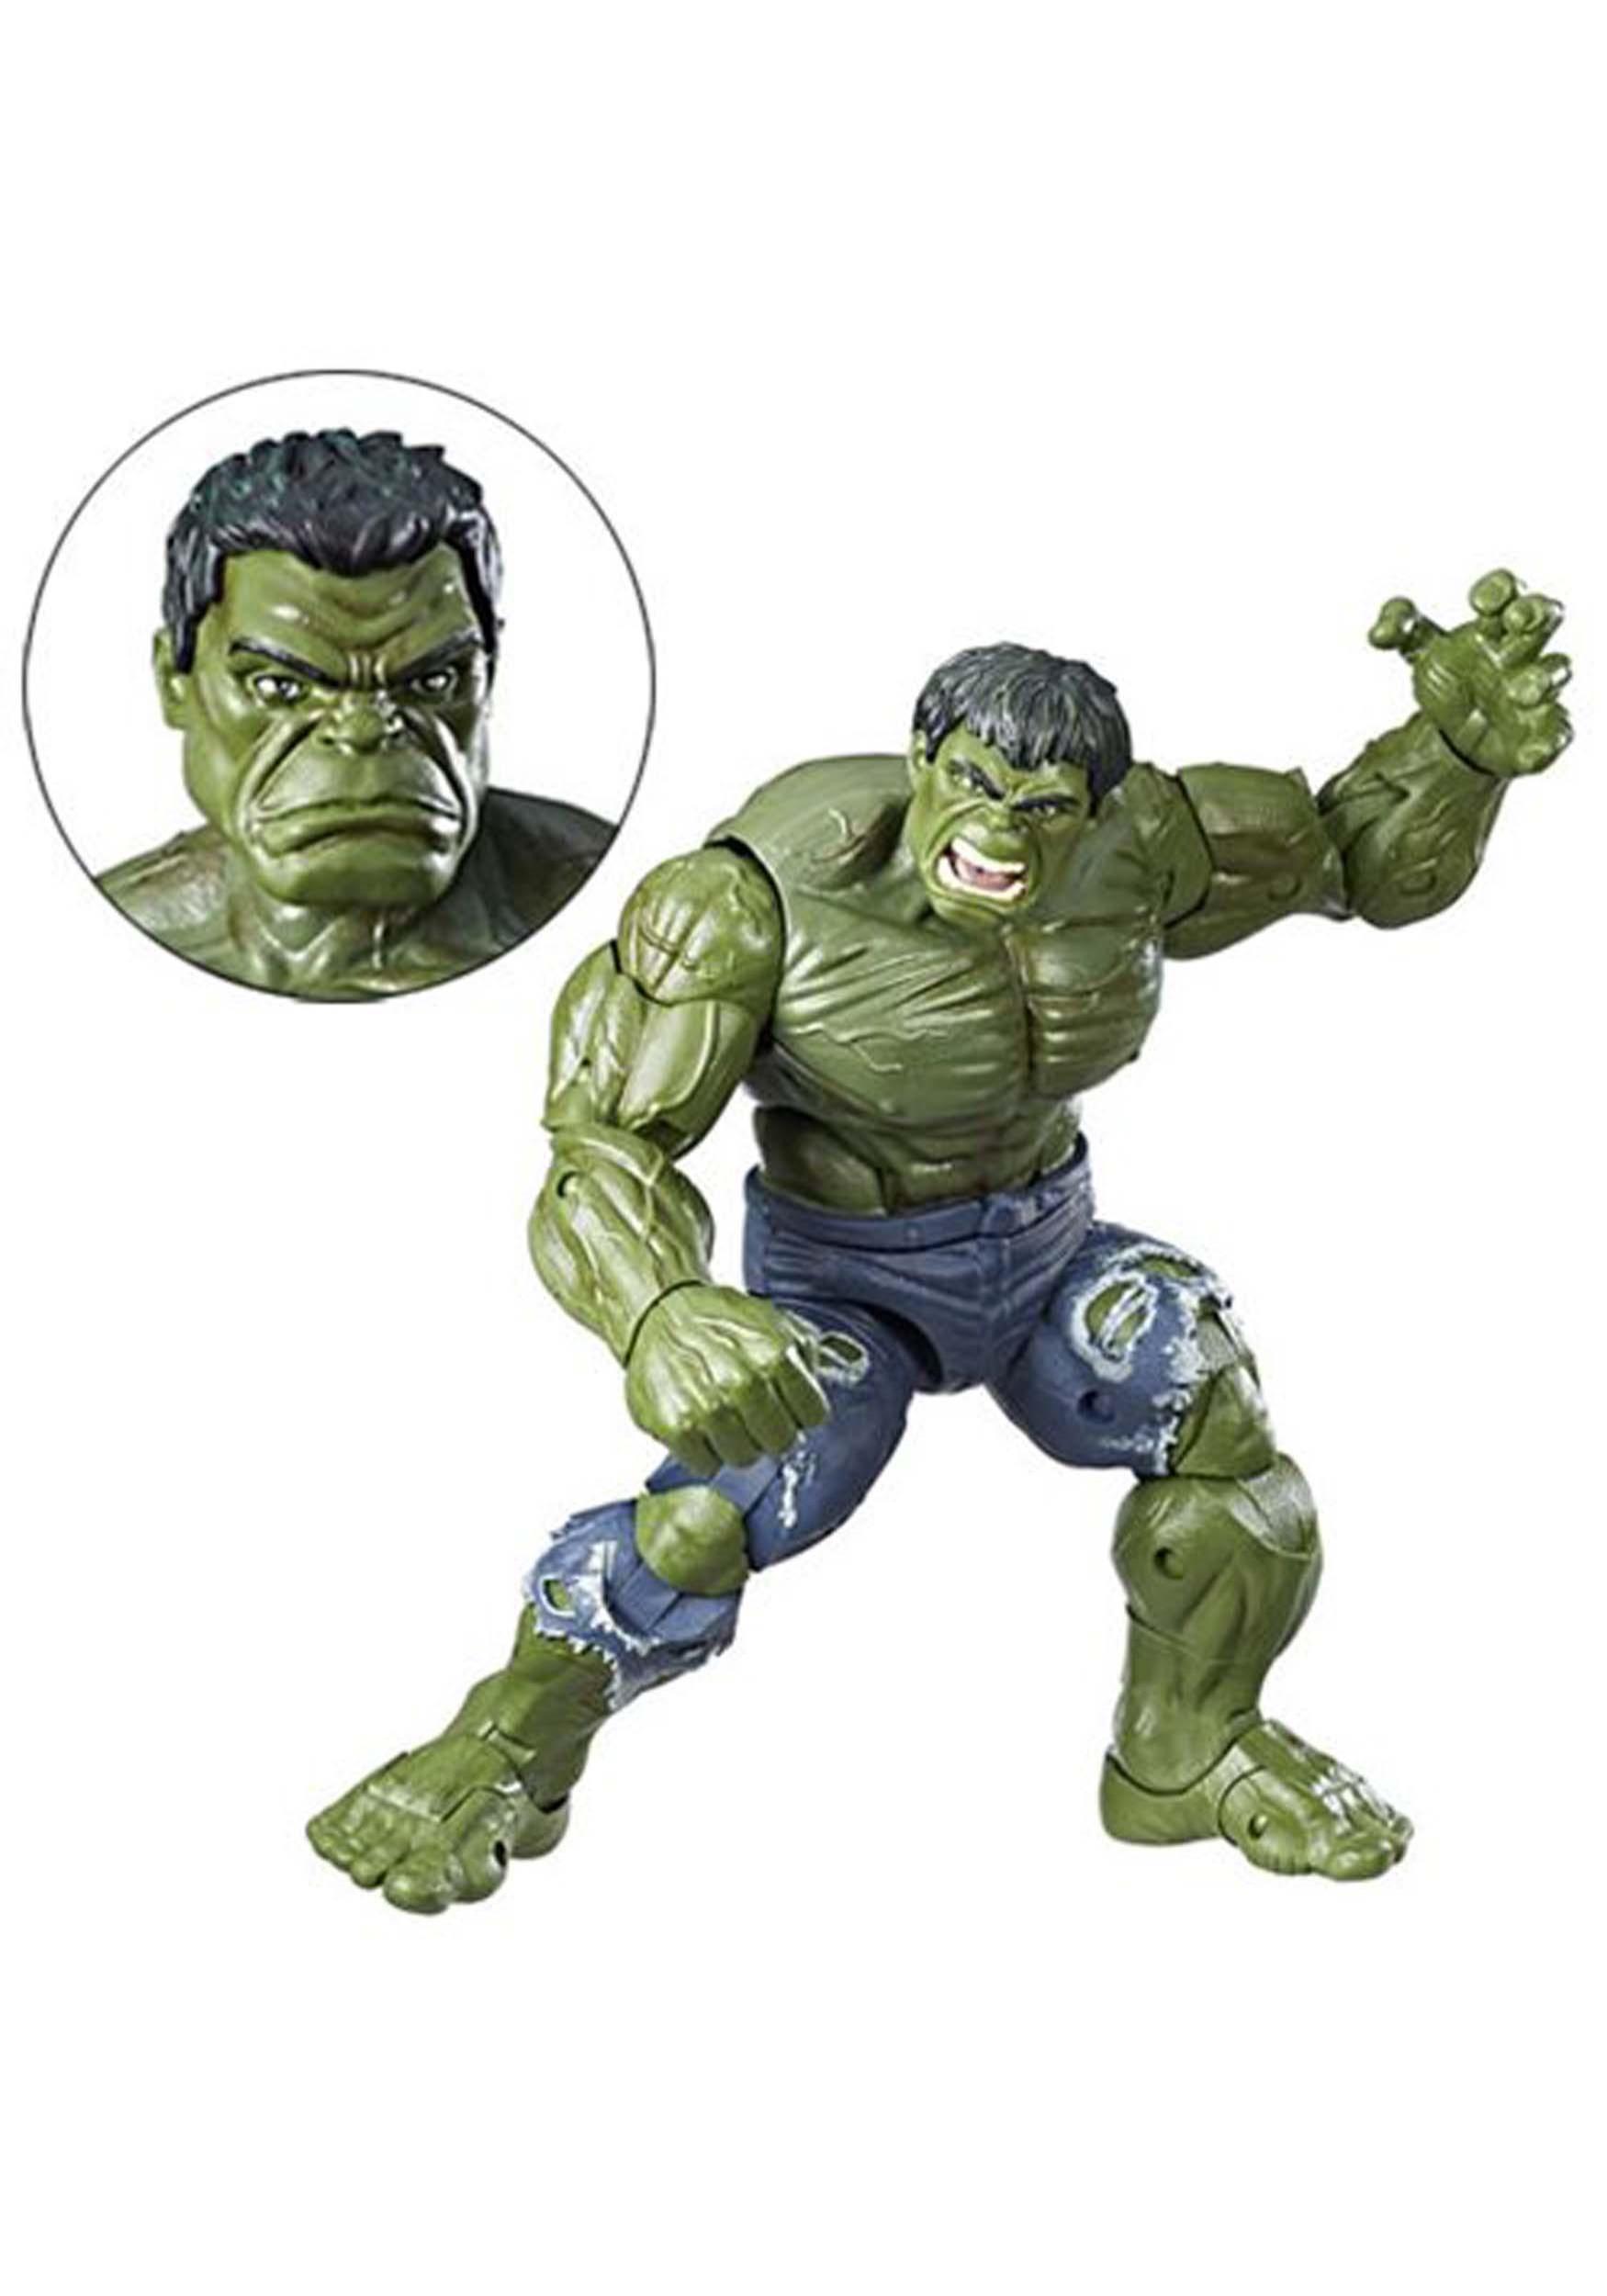 Marvel Legends Series 12-inch Scale Hulk Action Figure EEDHSC1880